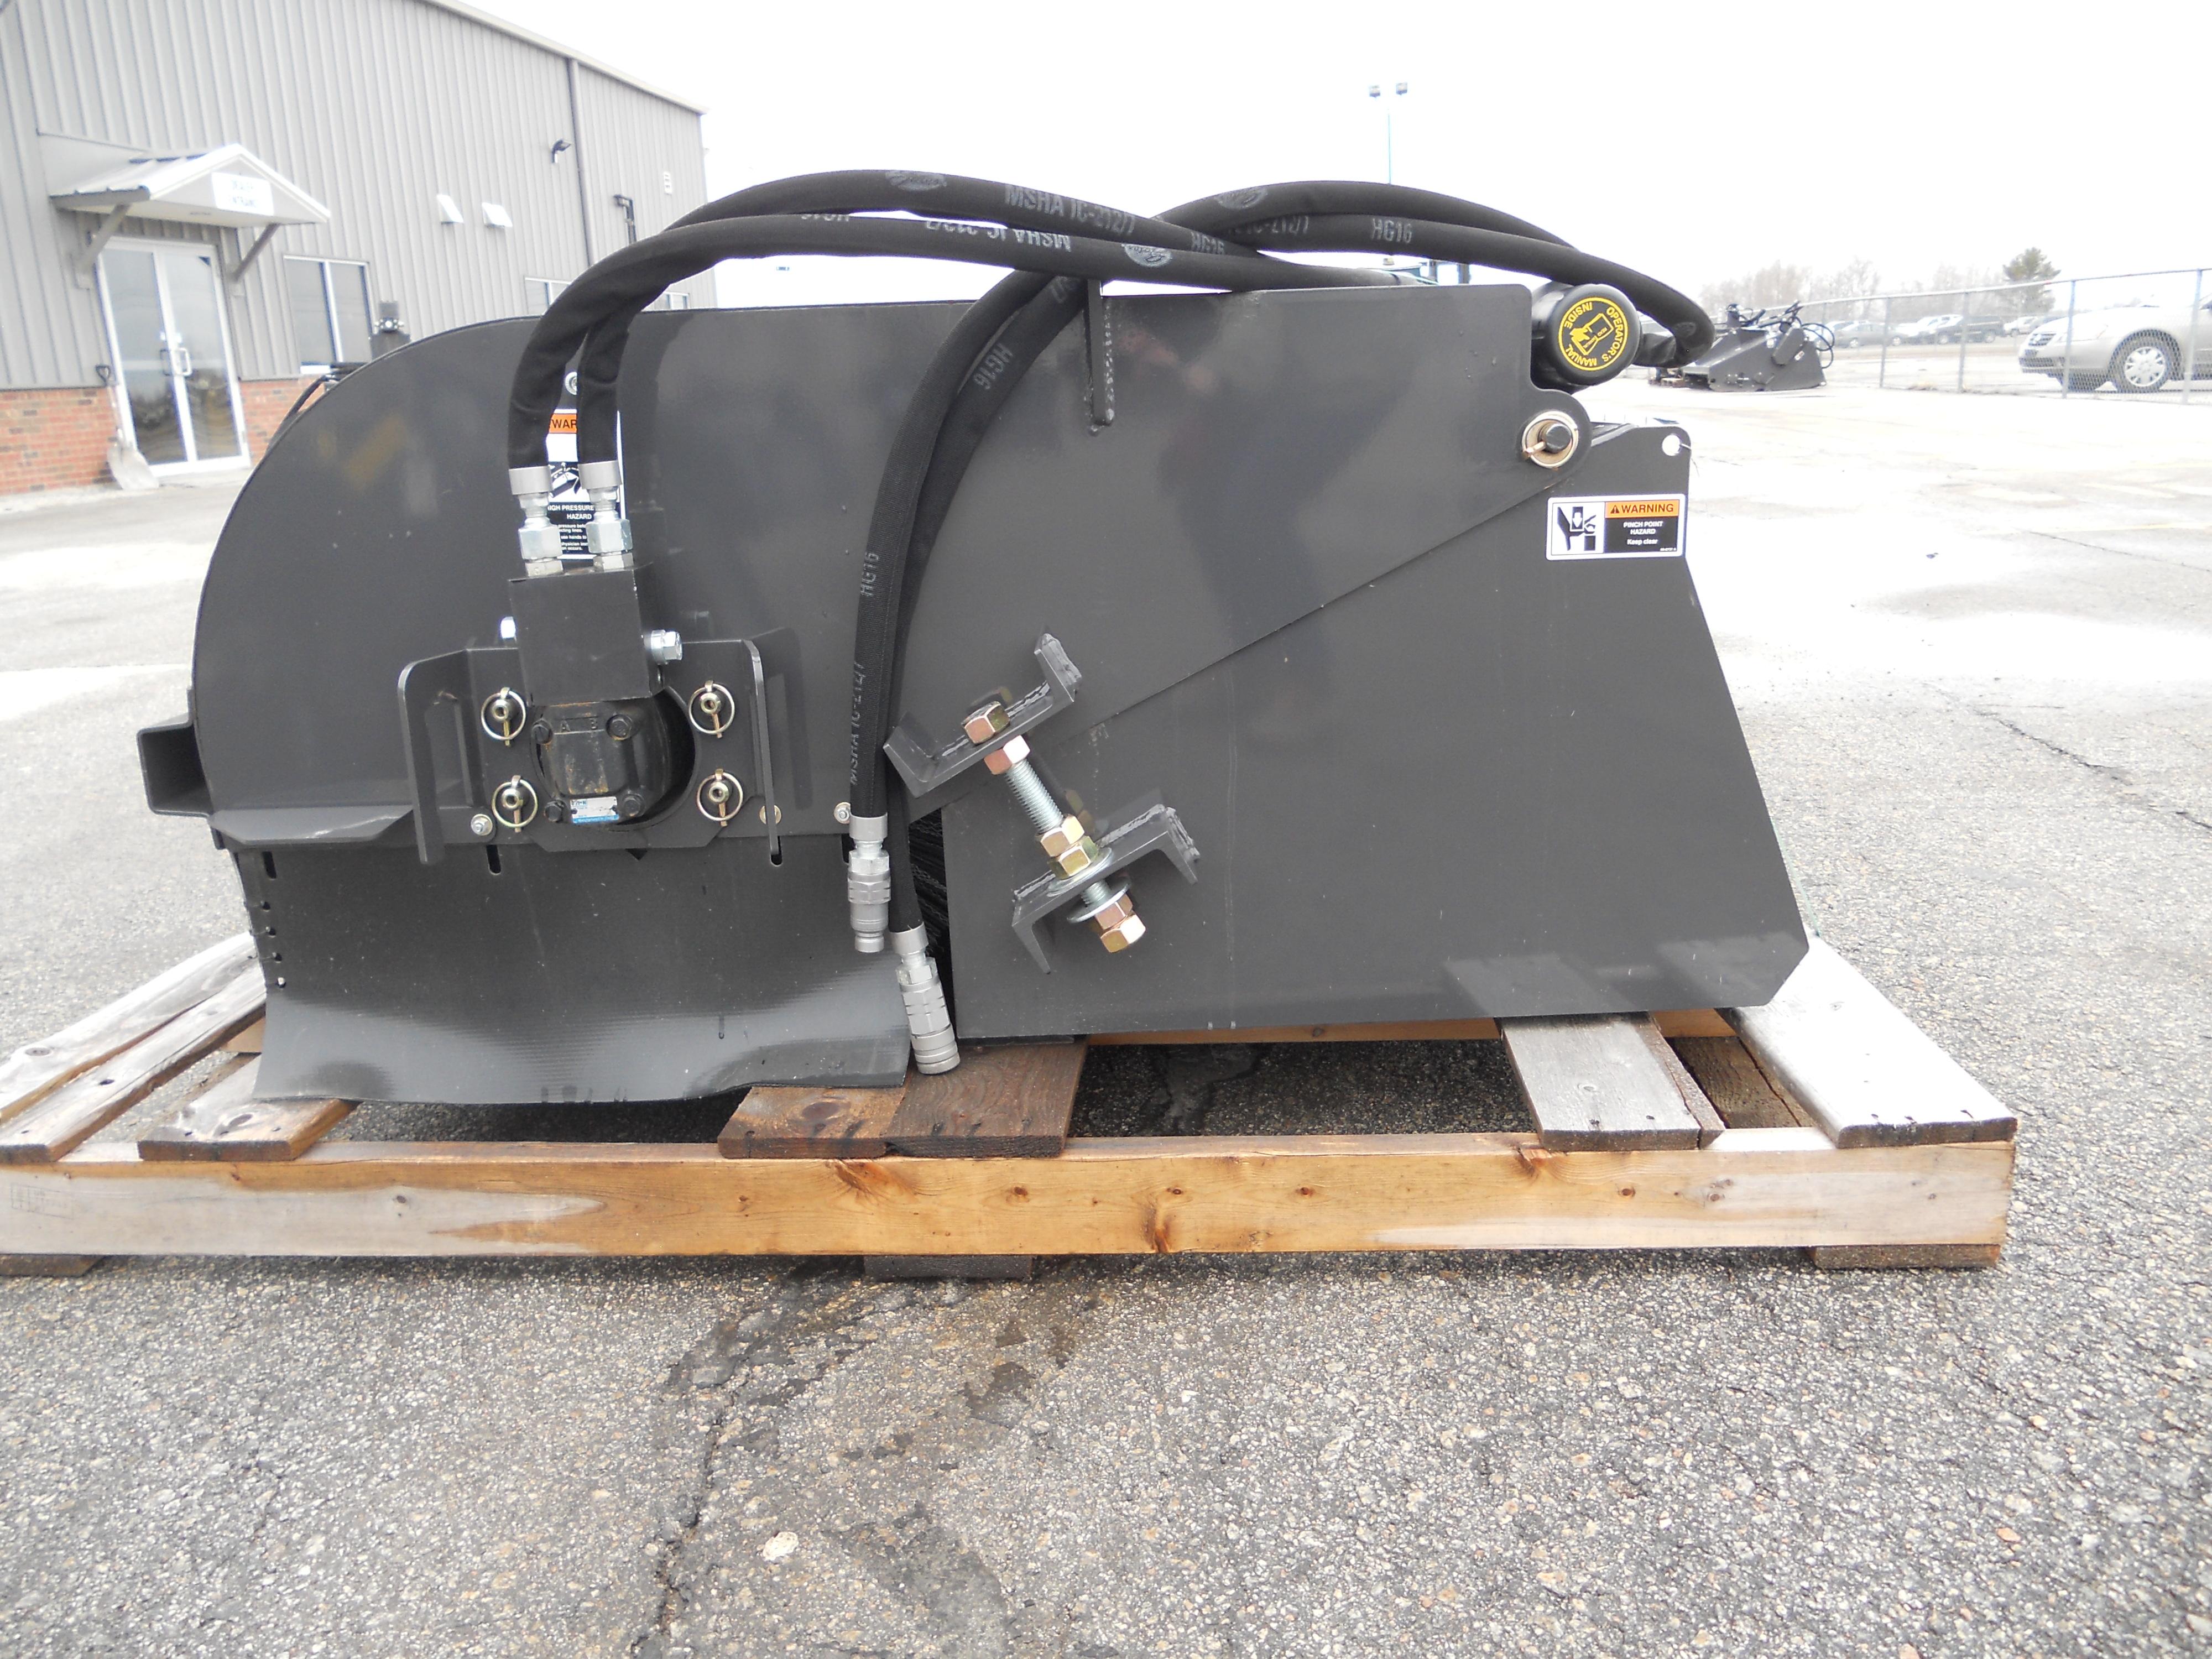 Public Equipment Auction Spring 2019 Hermon Me Central Maine